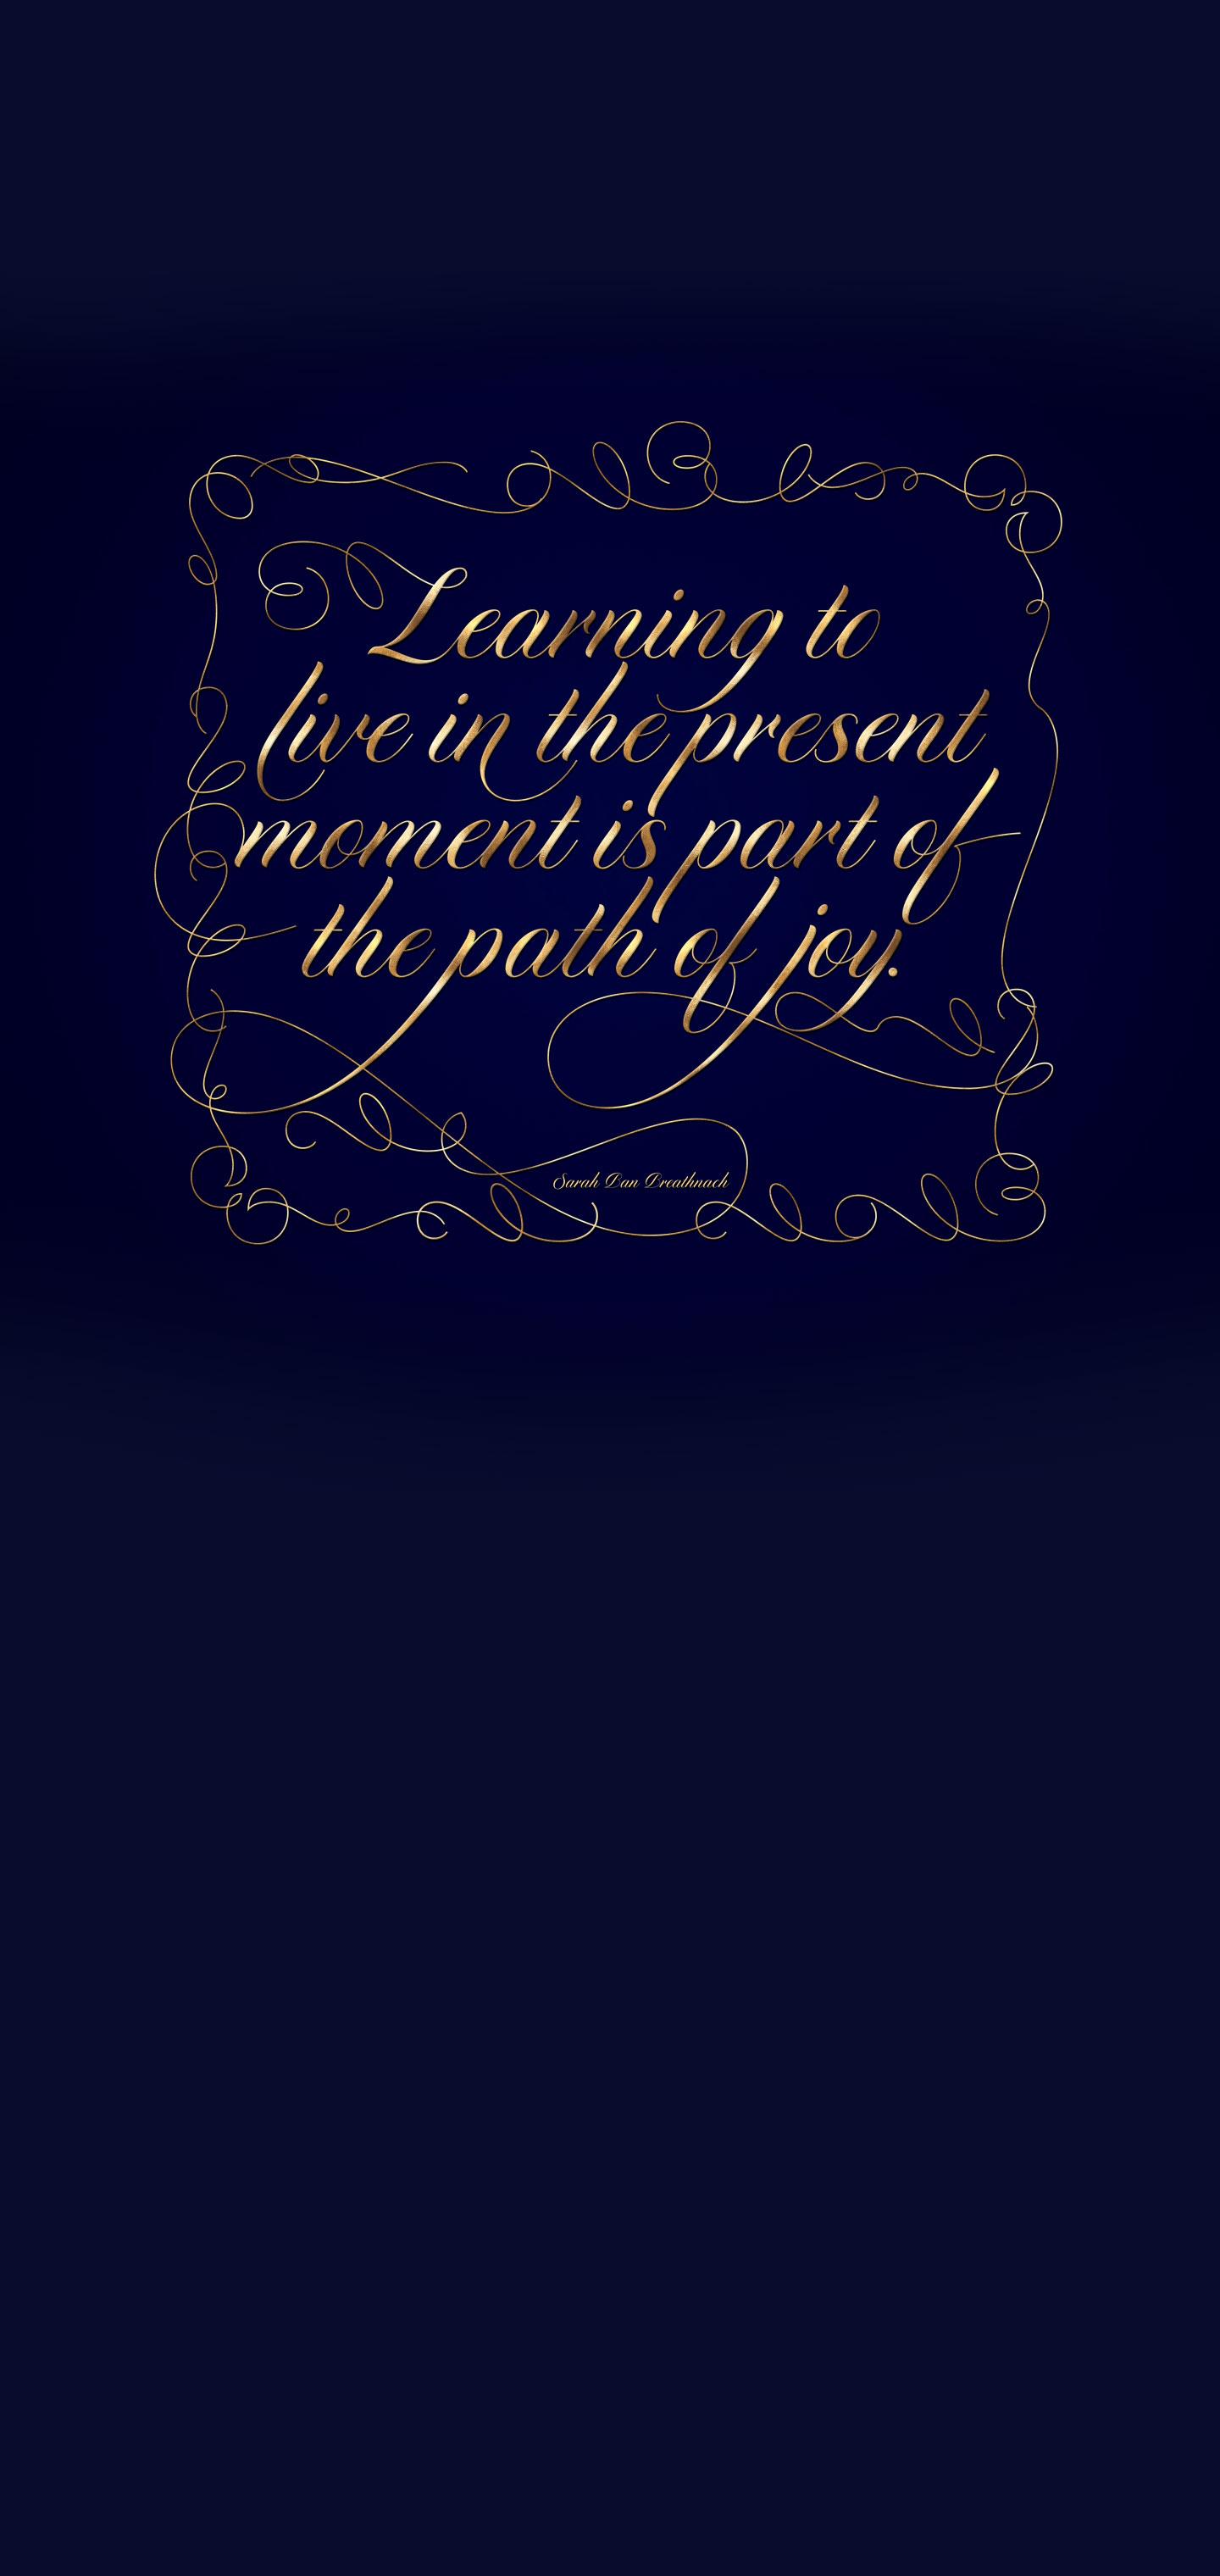 Motivational Quotes Wallpaper Samsung Motivational Quotes